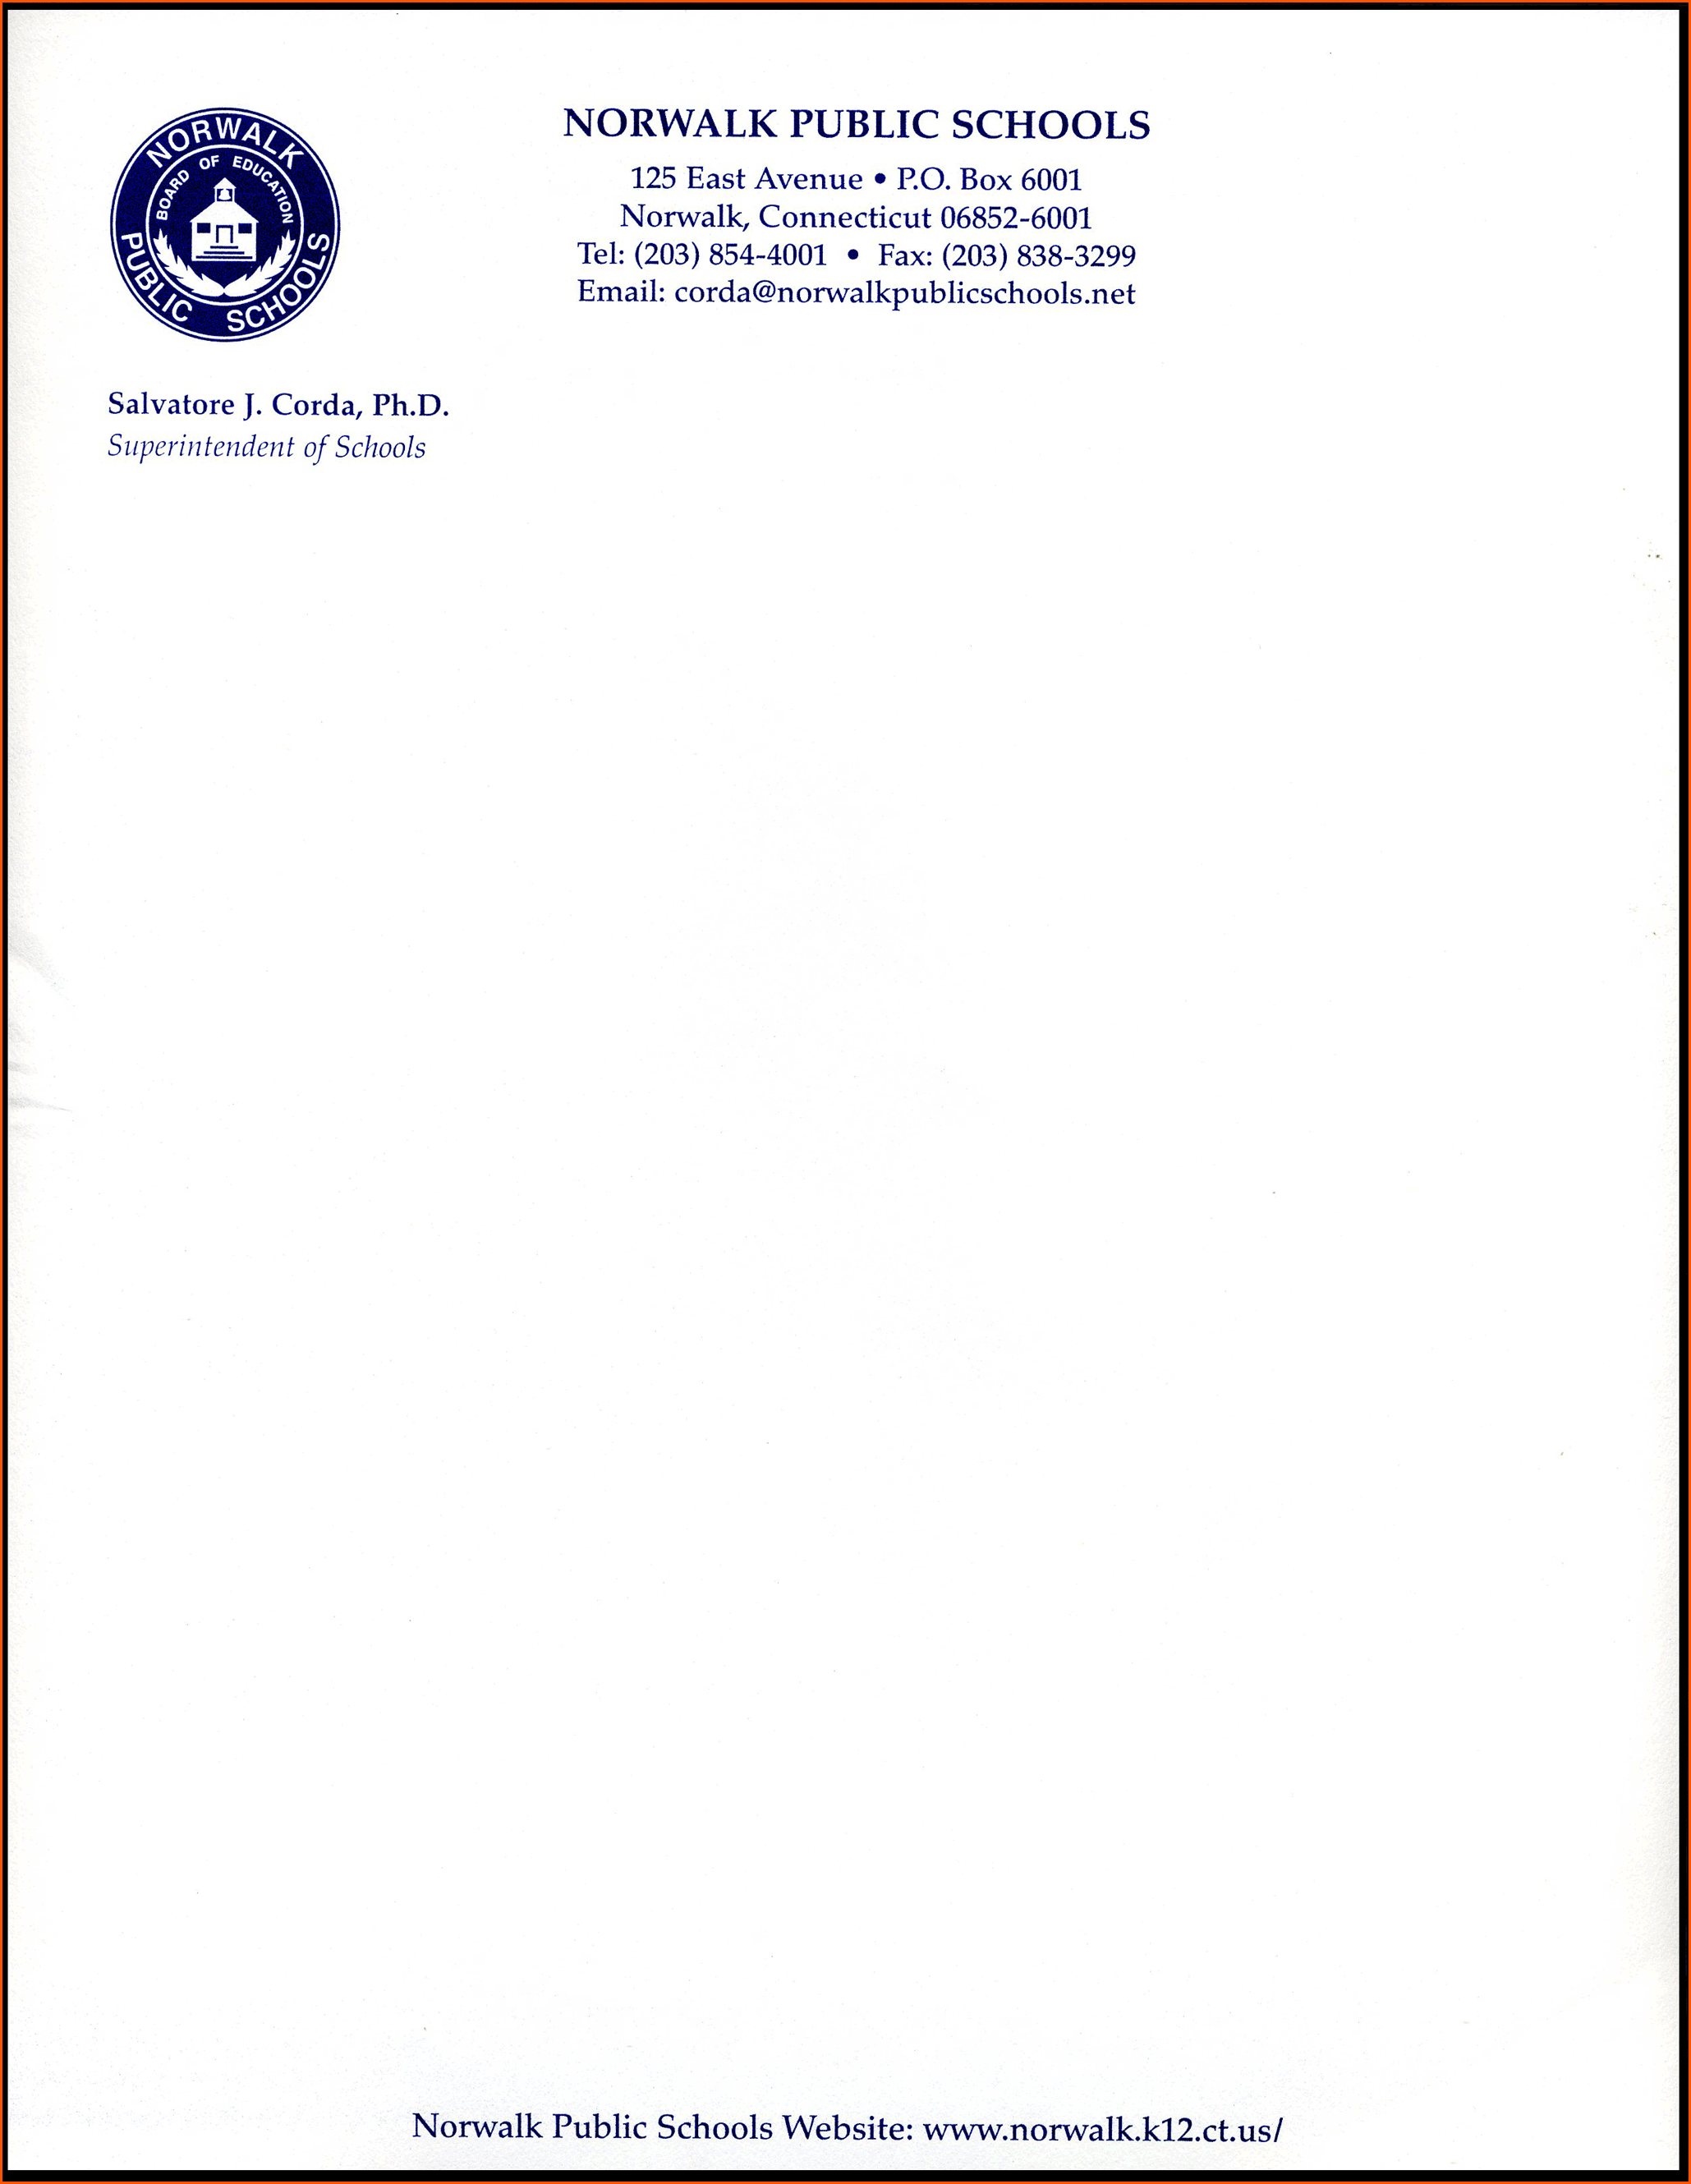 Company Letterhead Samples Denial Letter Sample Can Design Your